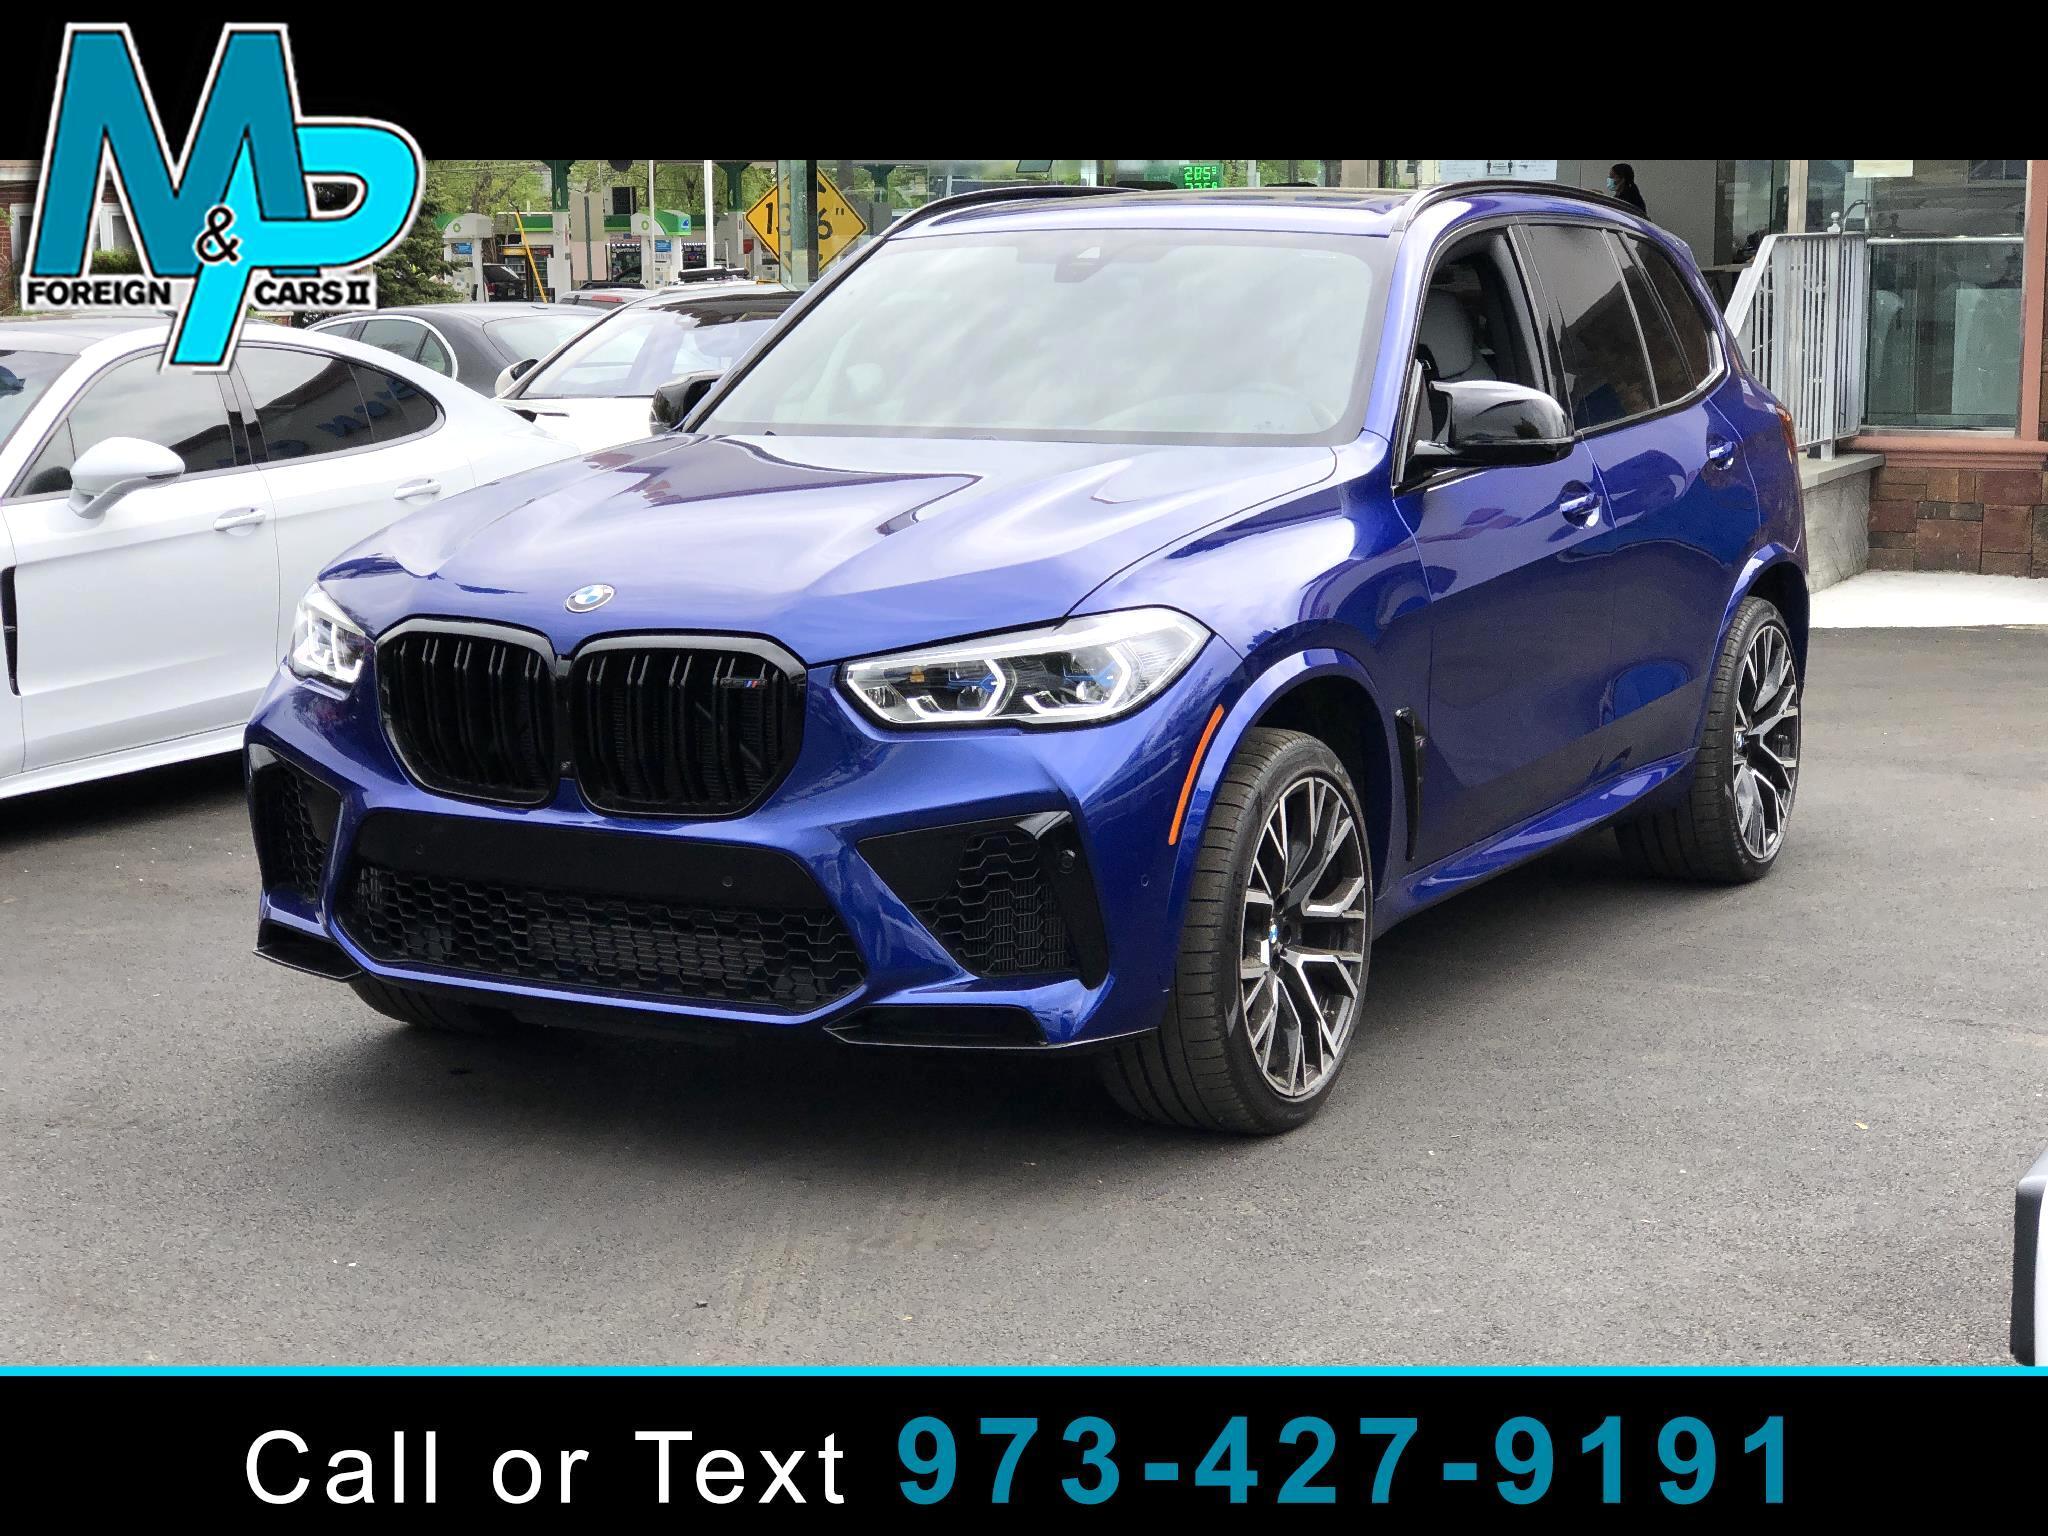 BMW X5 M Sports Activity Vehicle 2021